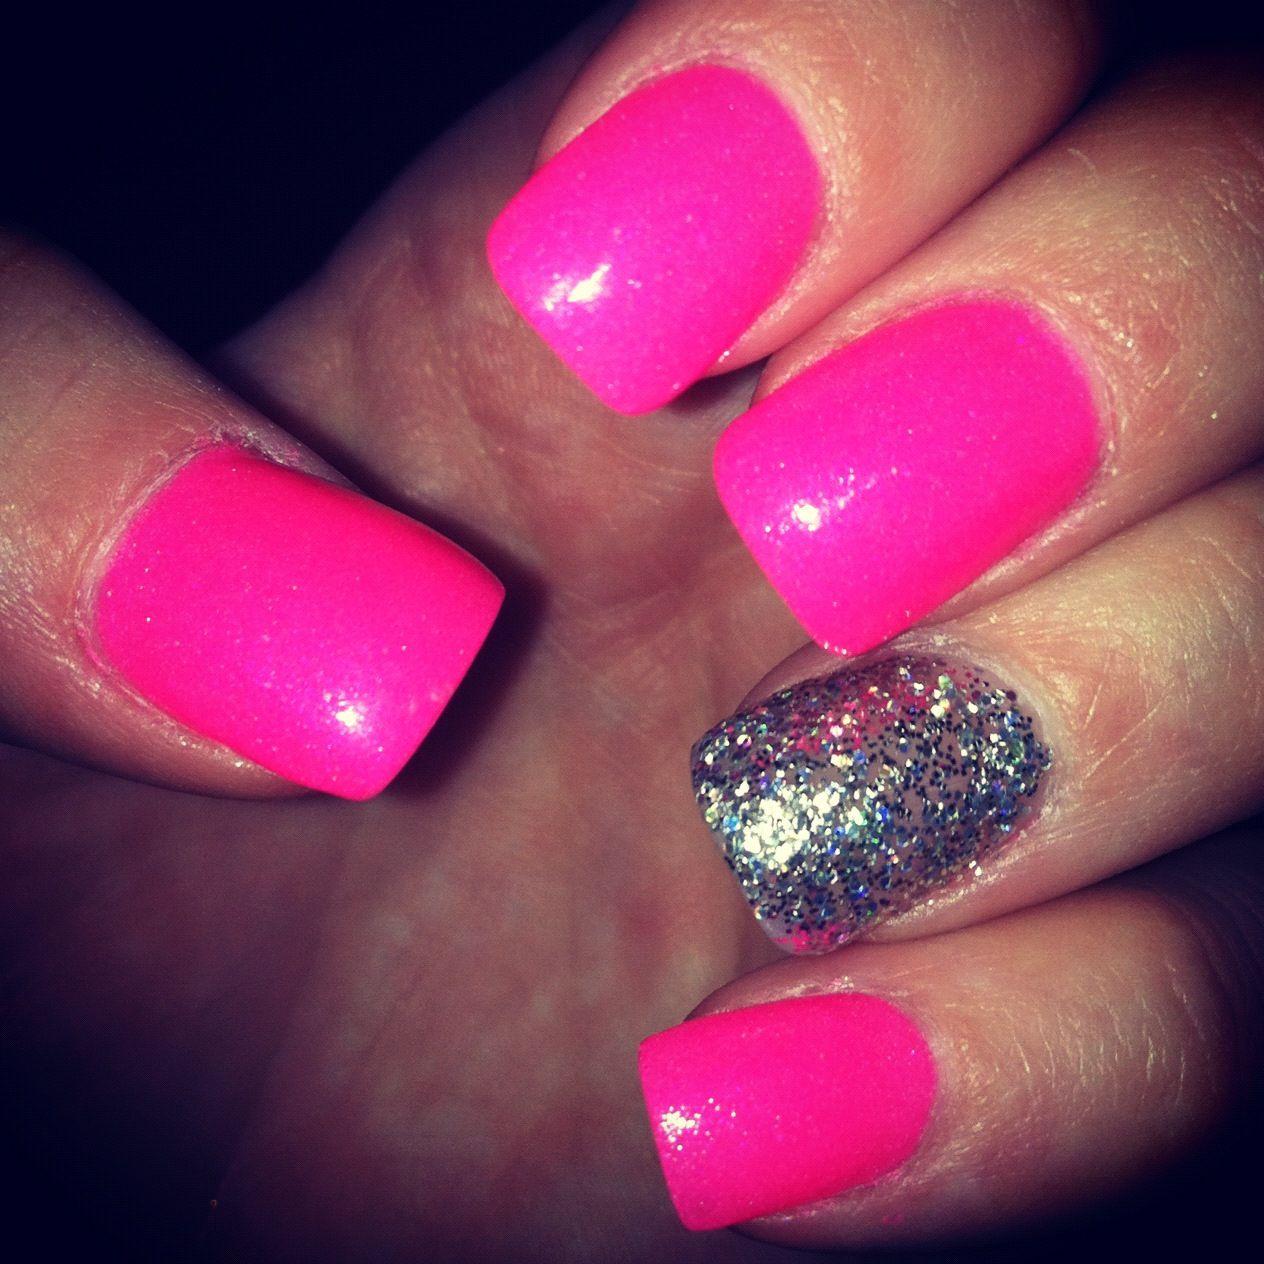 Barbie Pink Nails & Sparkle | beautƴ is skin deep.. ♡ | Pinterest ...